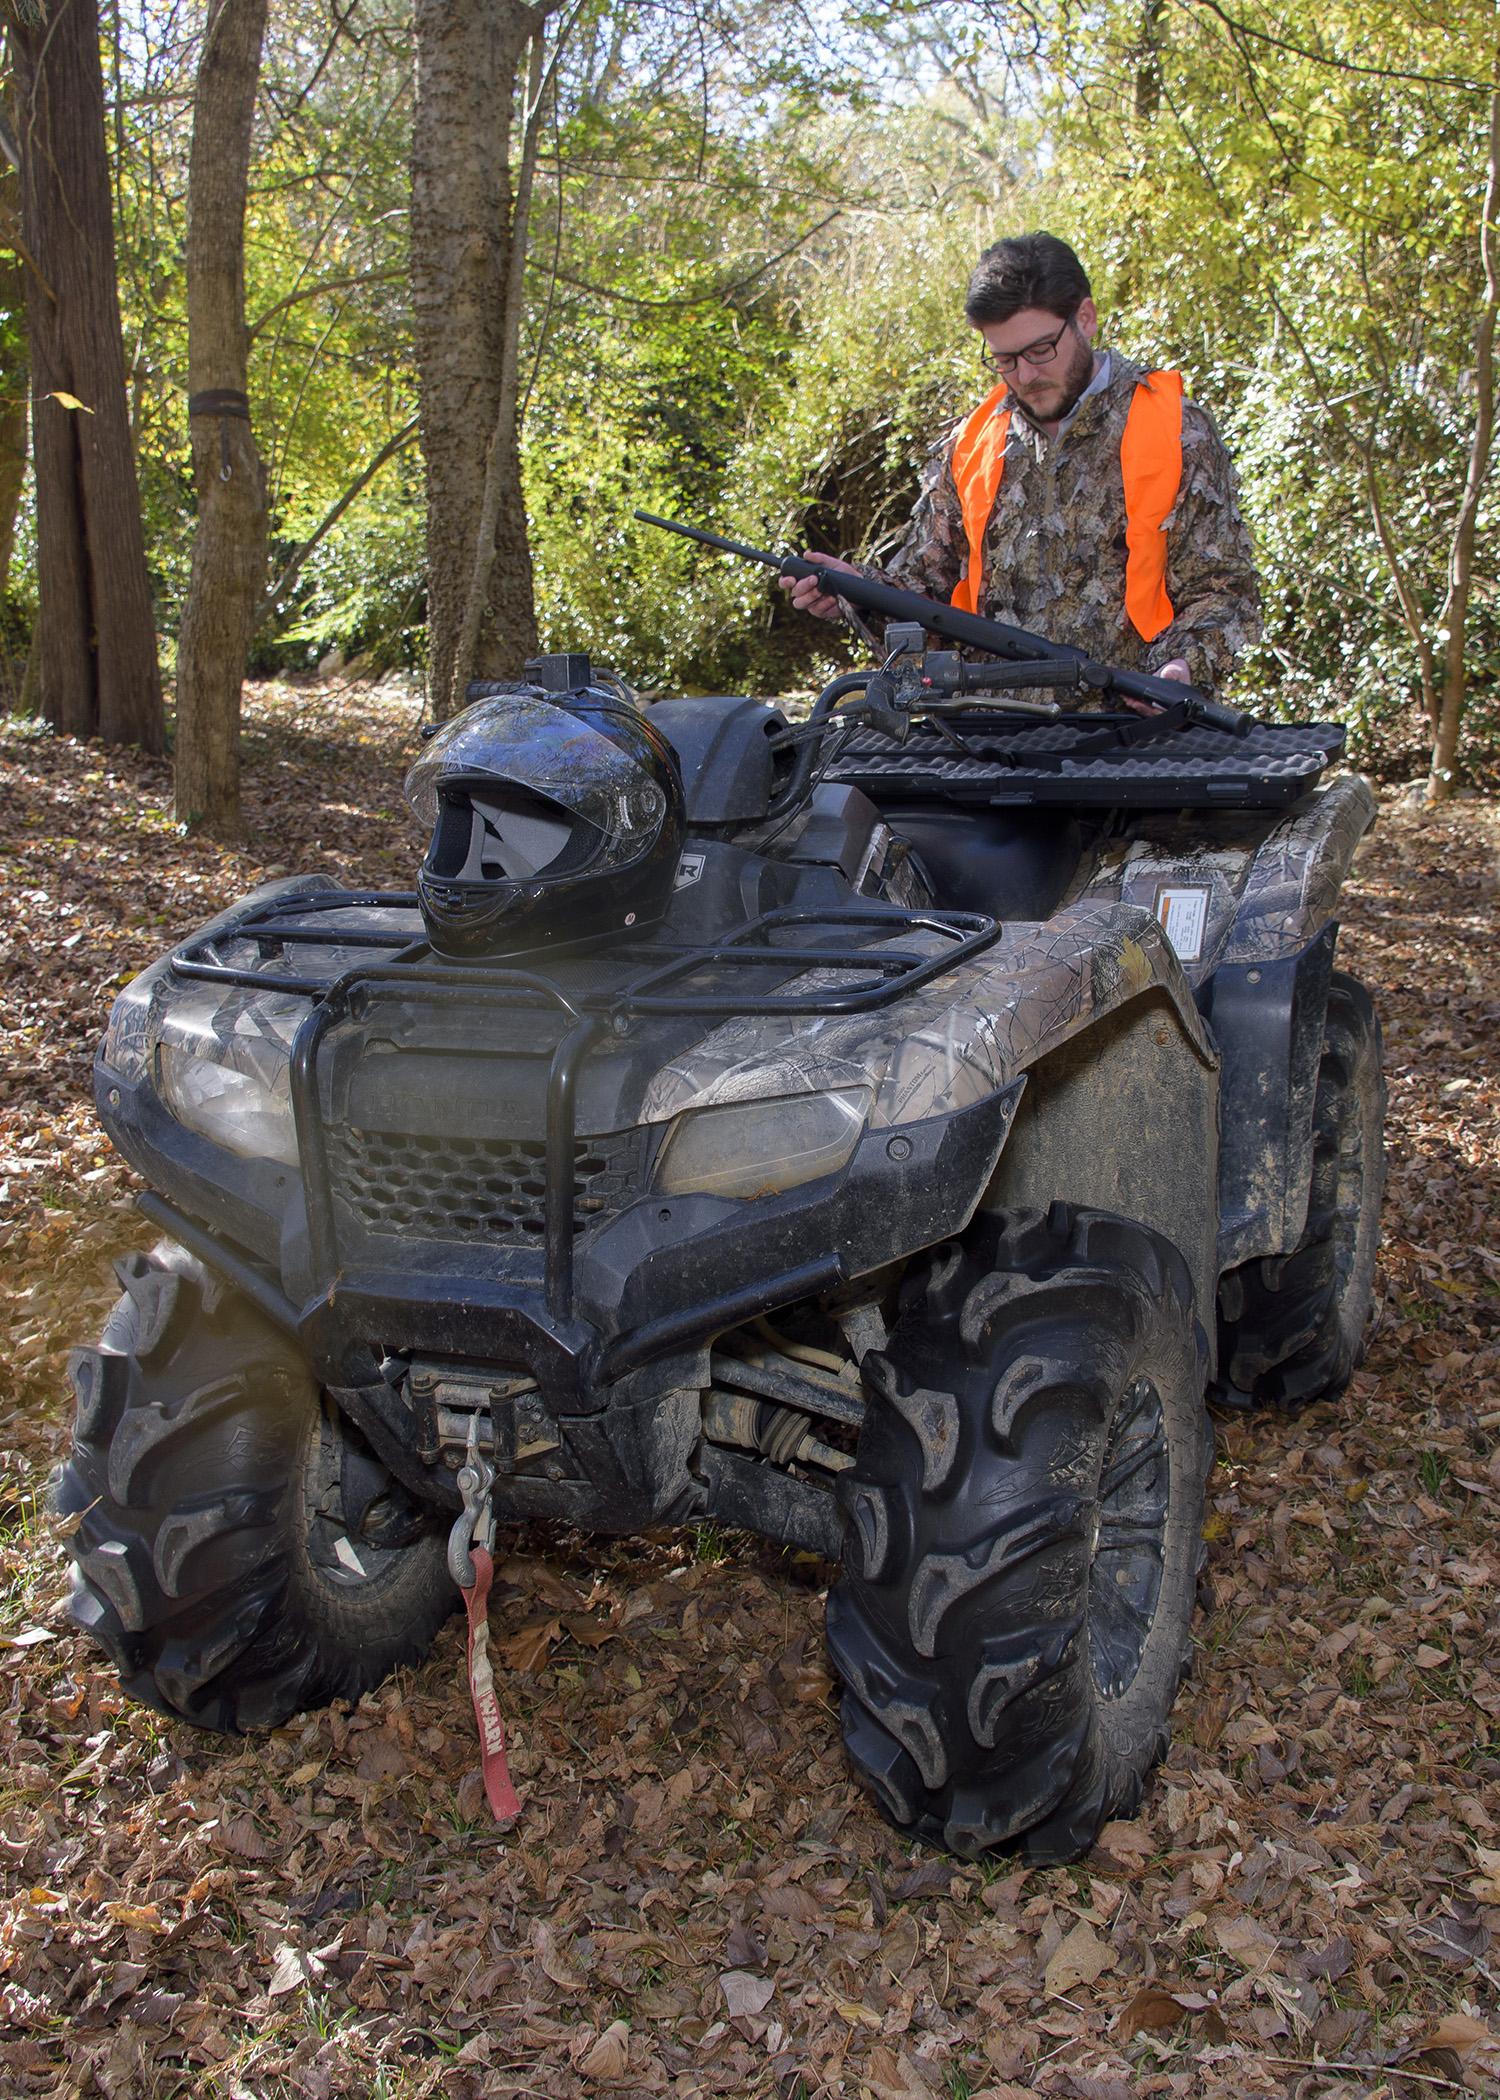 ATV Safety PSA Contest | Mississippi State University